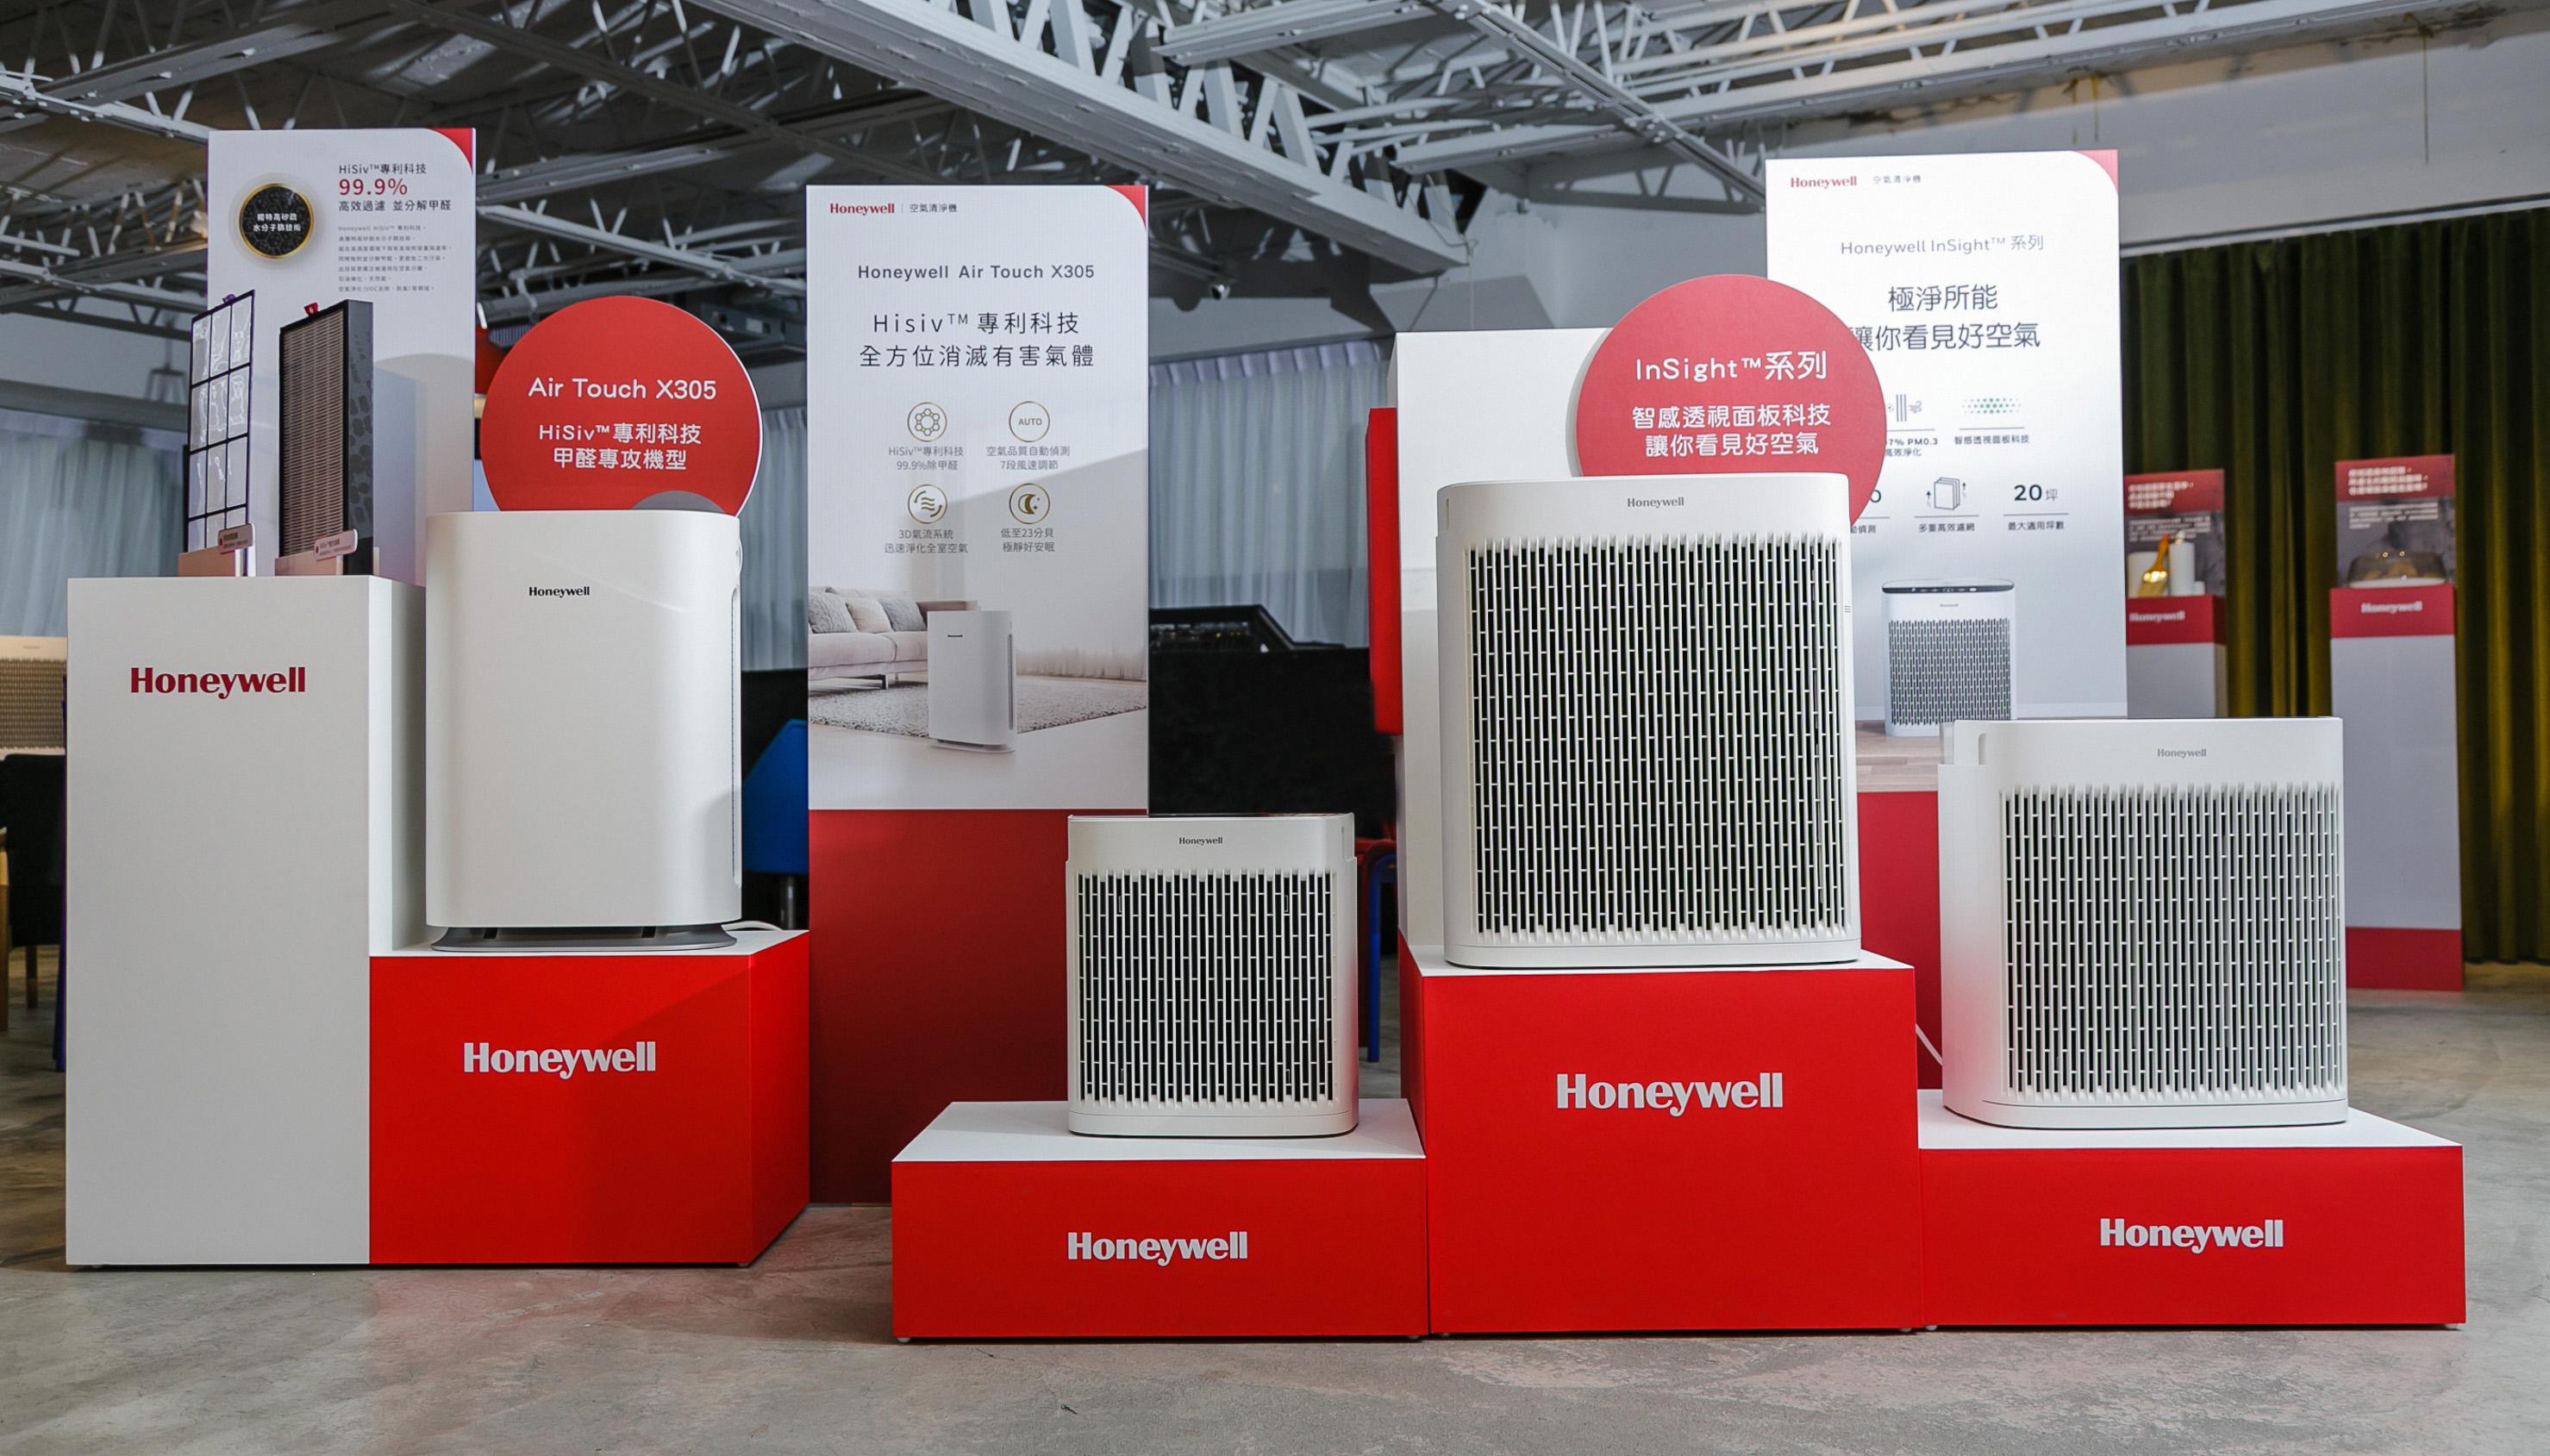 Honeywell 年度新品Air Touch X305、InSightTM系列盛大亮相,提供最適切台灣室內空污問題的解決方案!